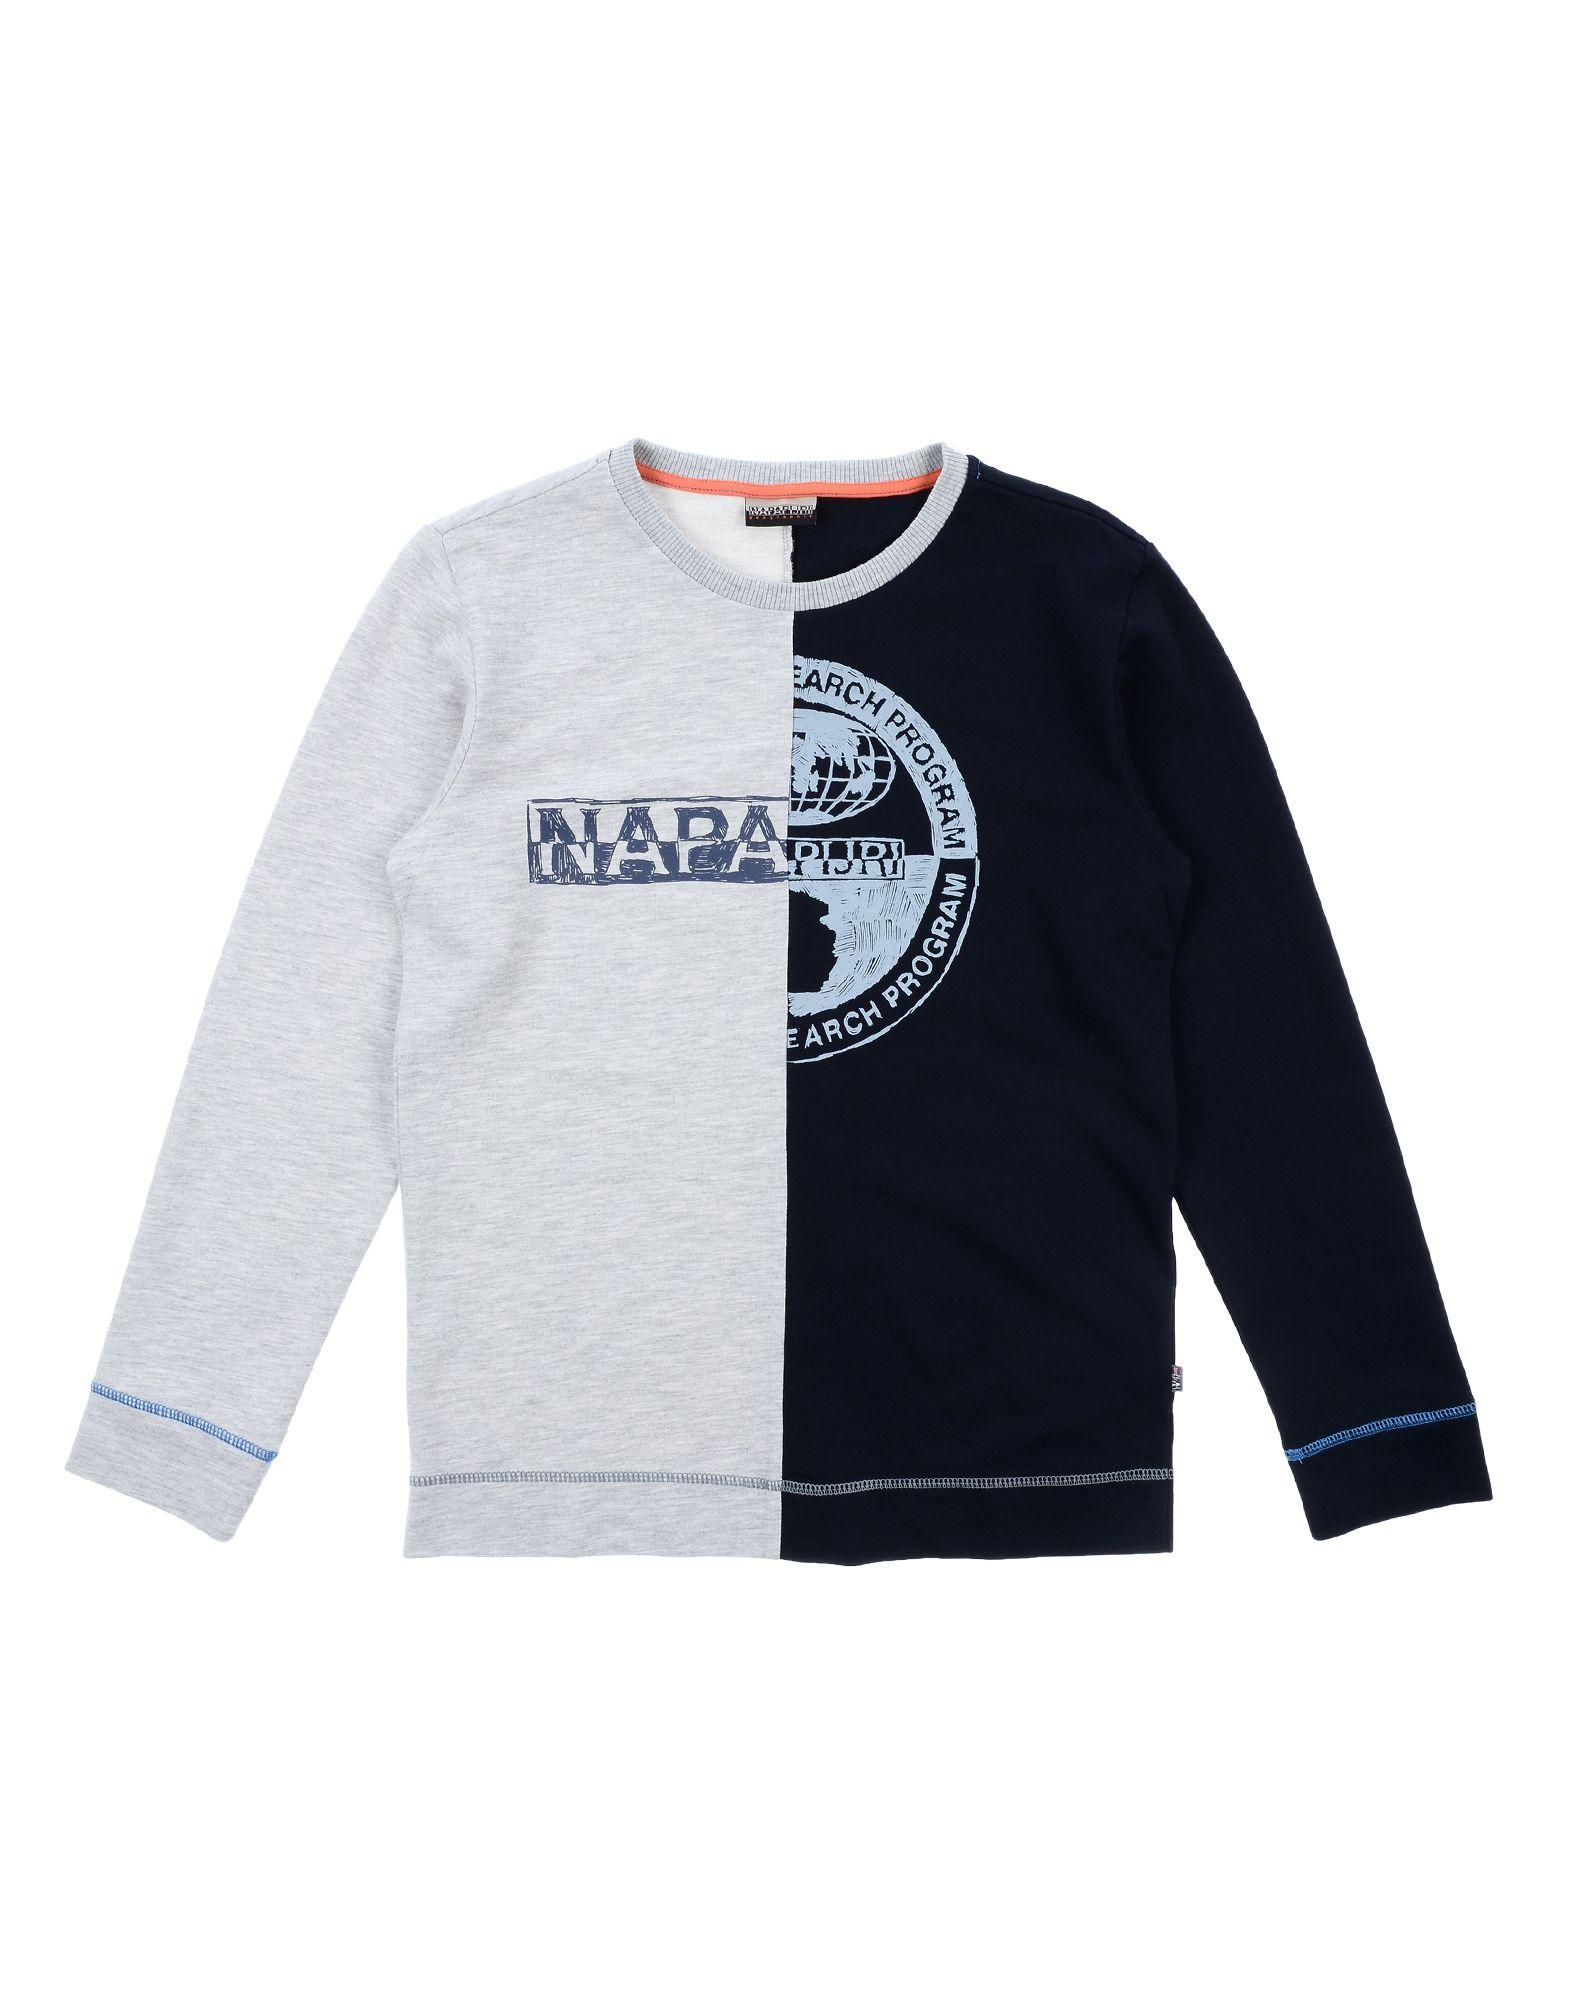 NAPAPIJRI Jungen 9-16 jahre Sweatshirt4 blau